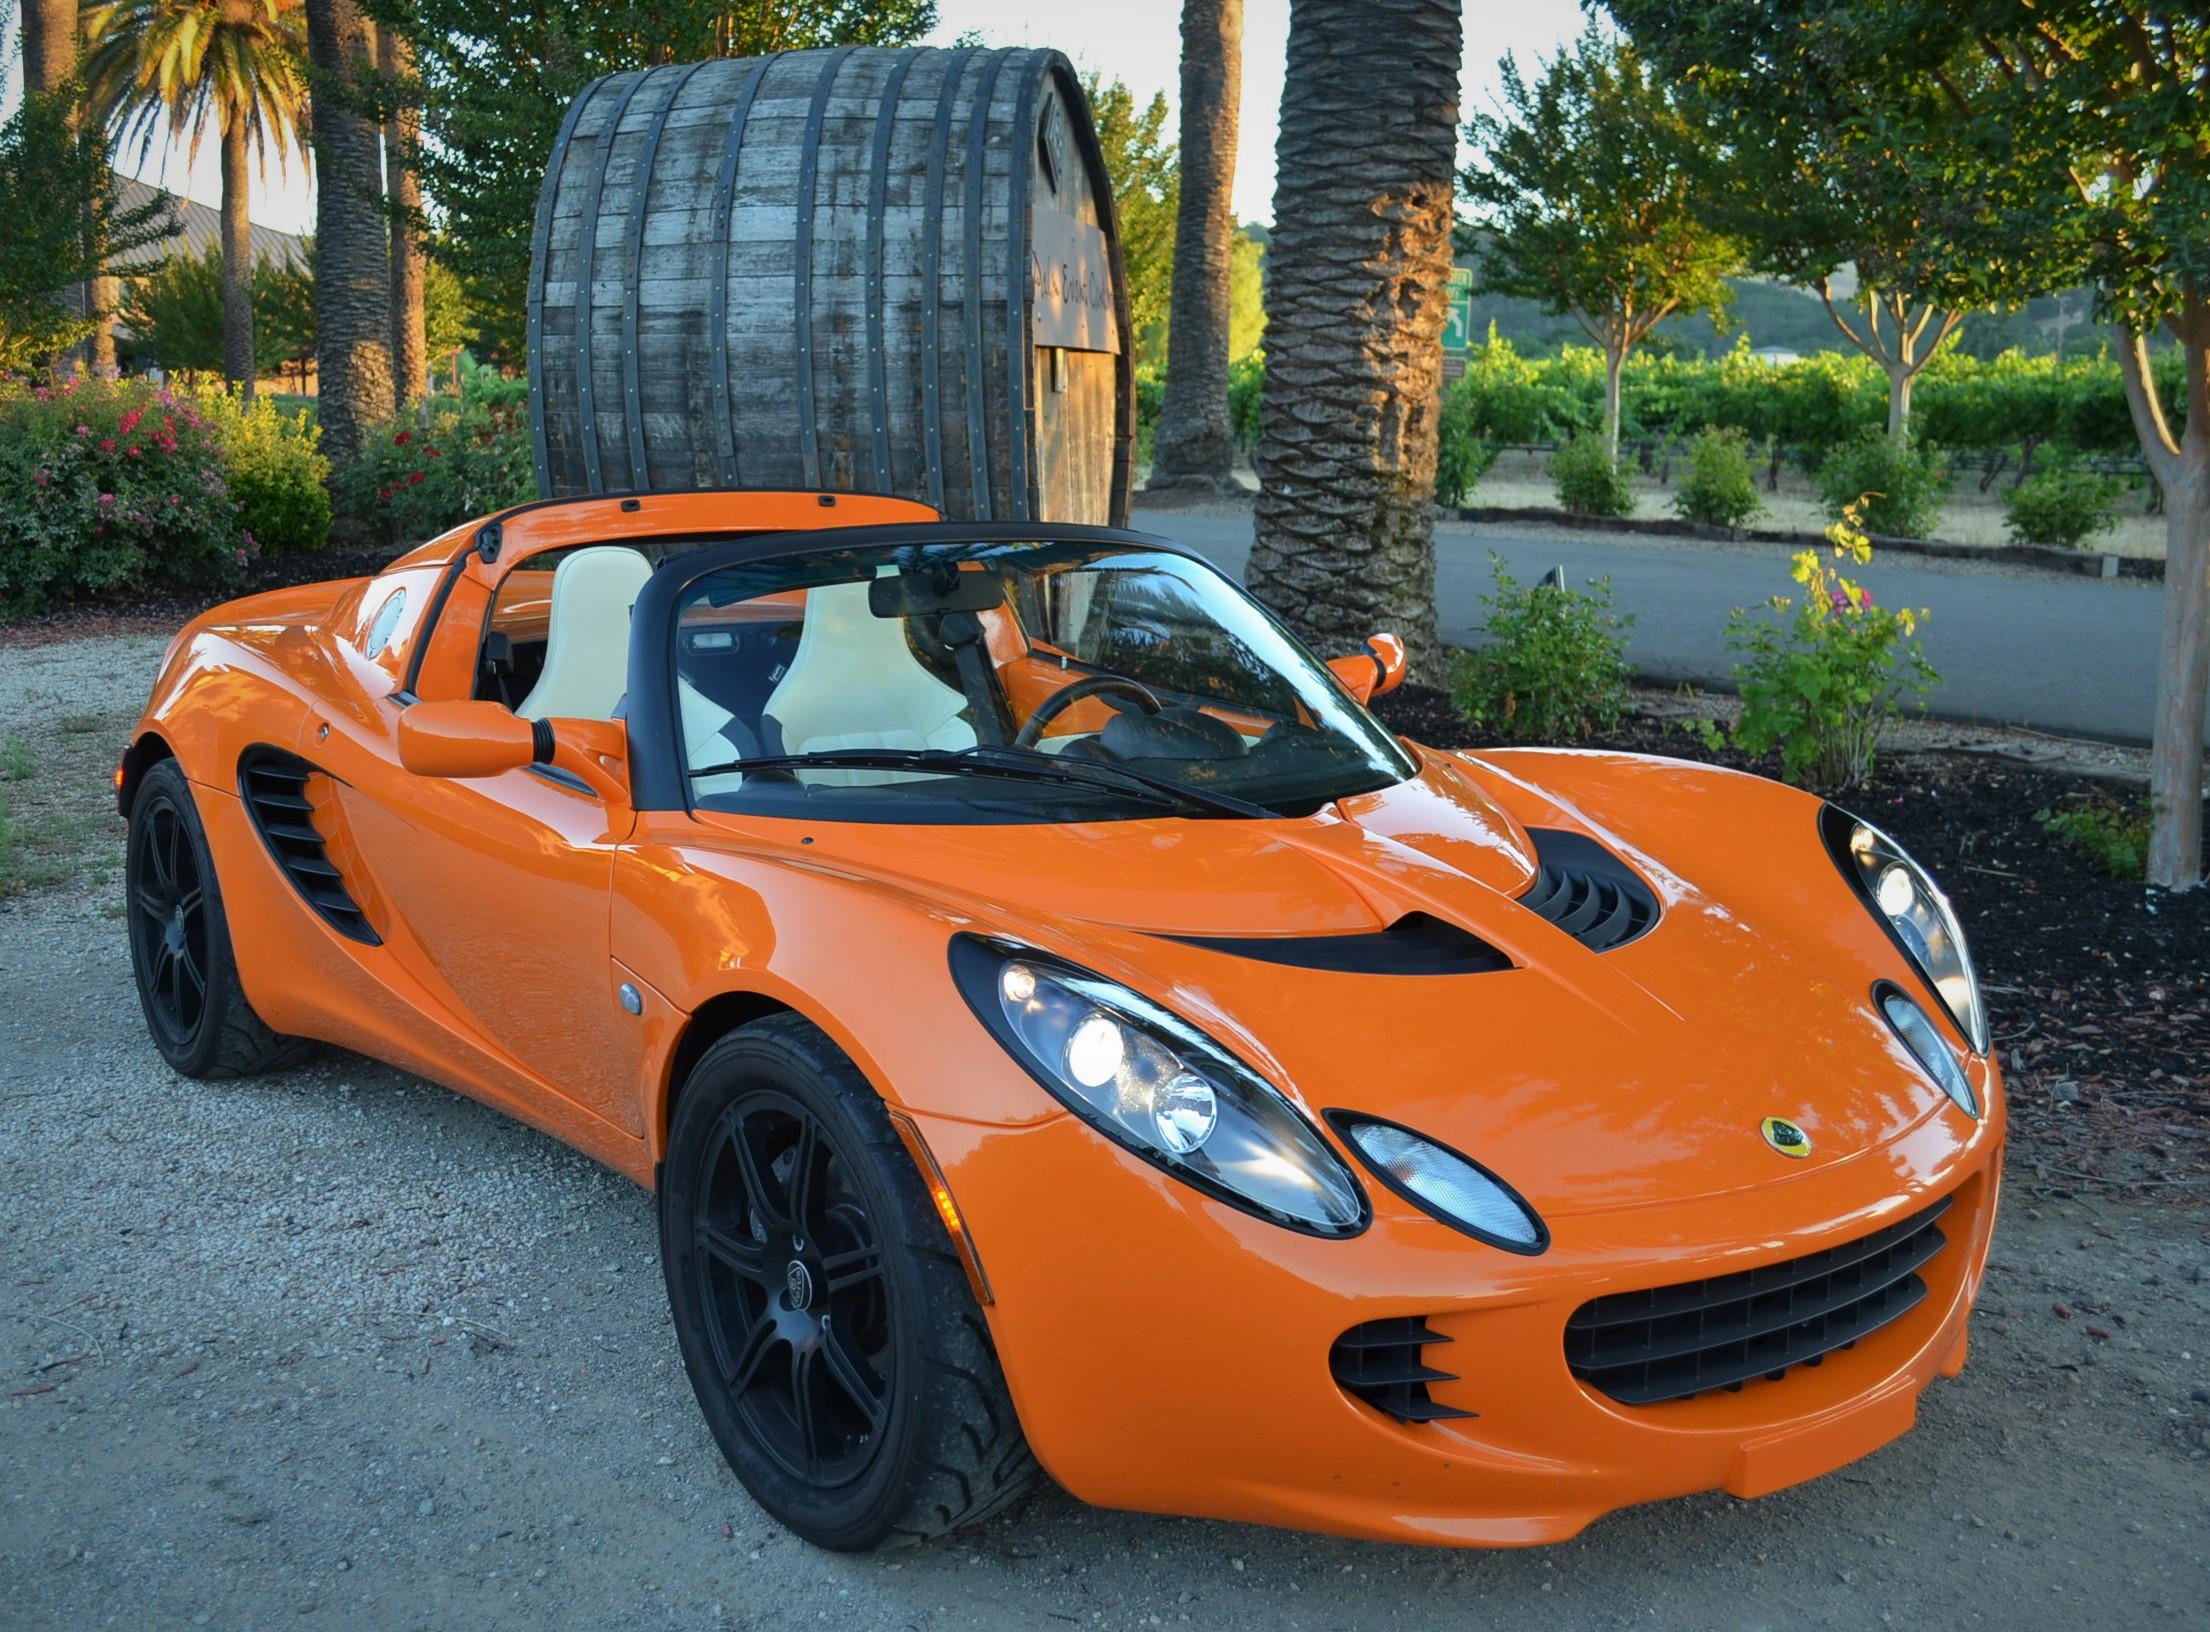 2007 lotus elise classic cars ltd pleasanton california 2007 lotus elise classic cars ltd